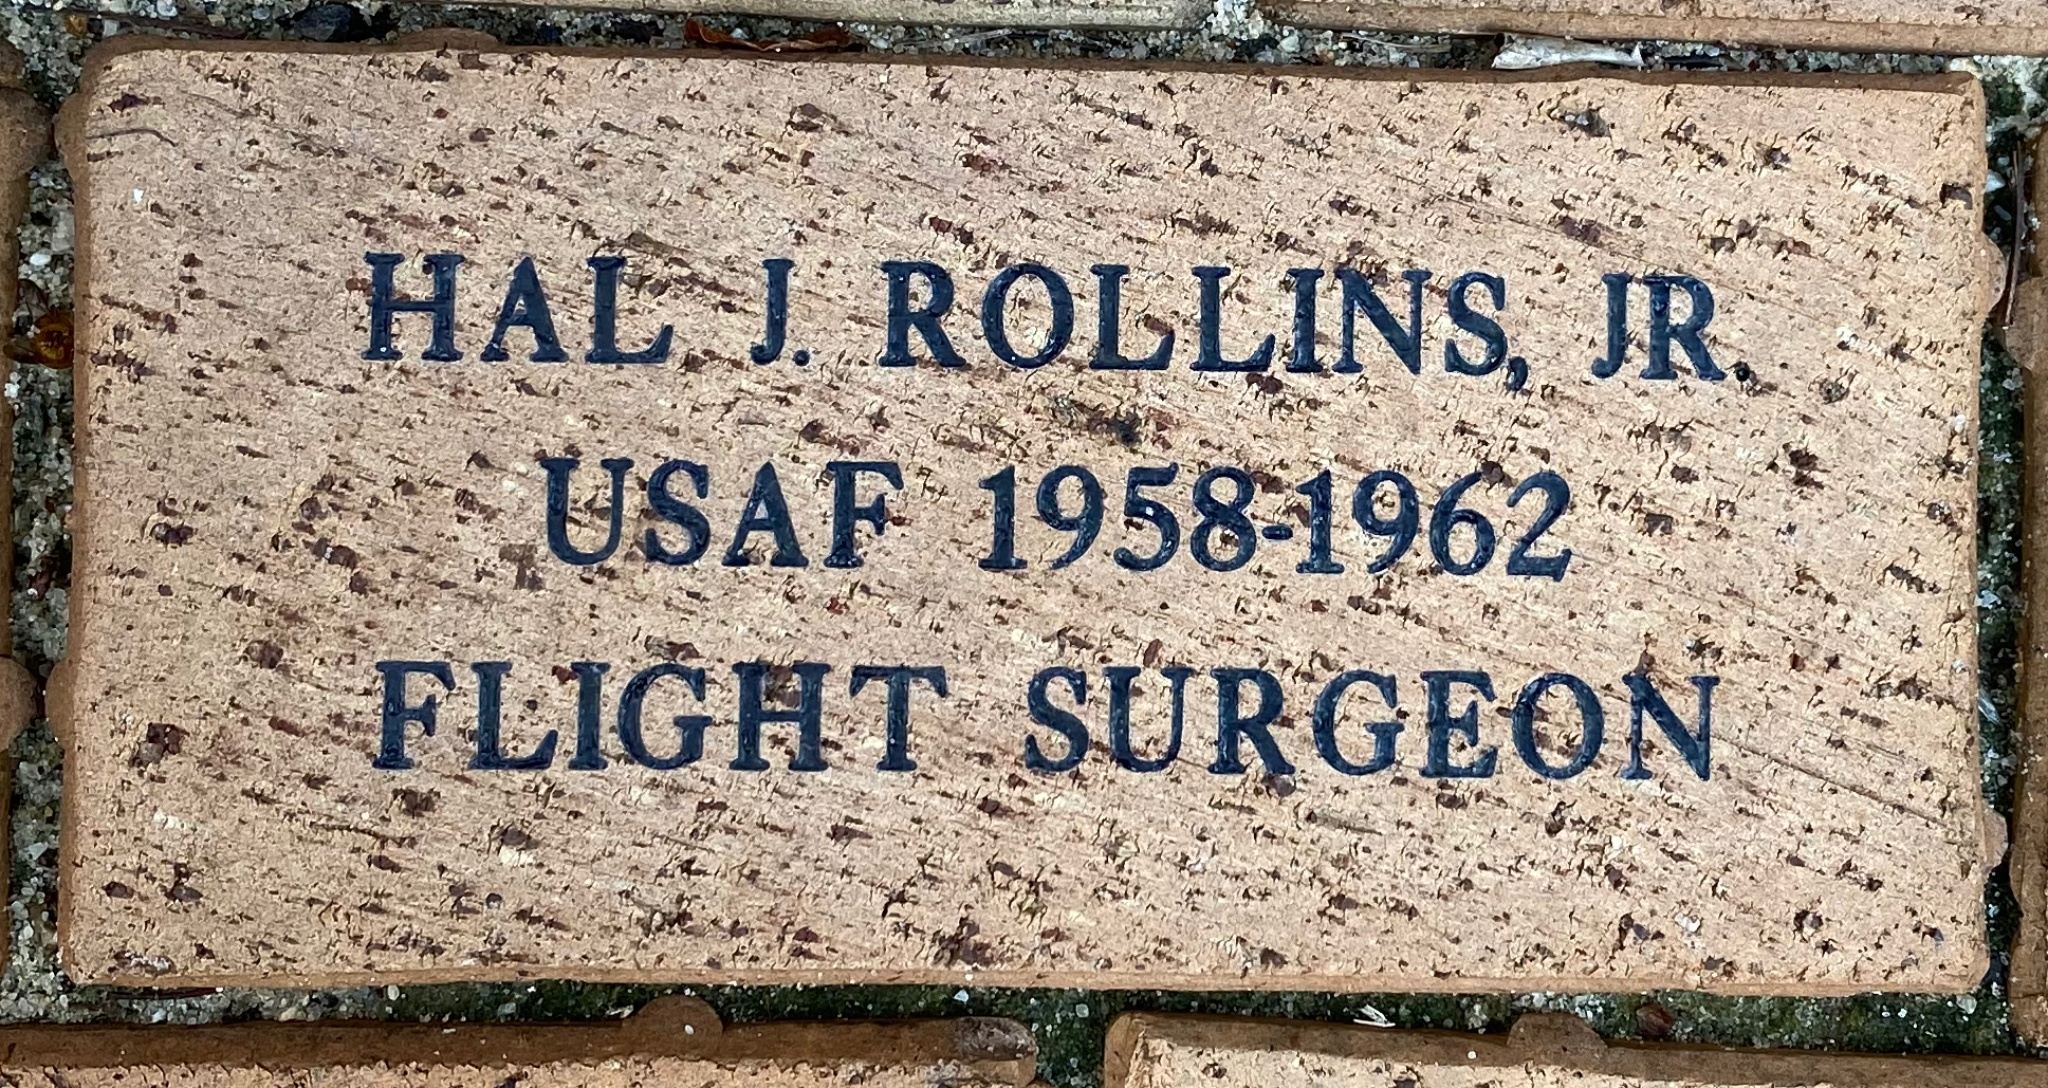 HAL J. ROLLINS, JR USAF 1958-1962 FLIGHT SURGEON